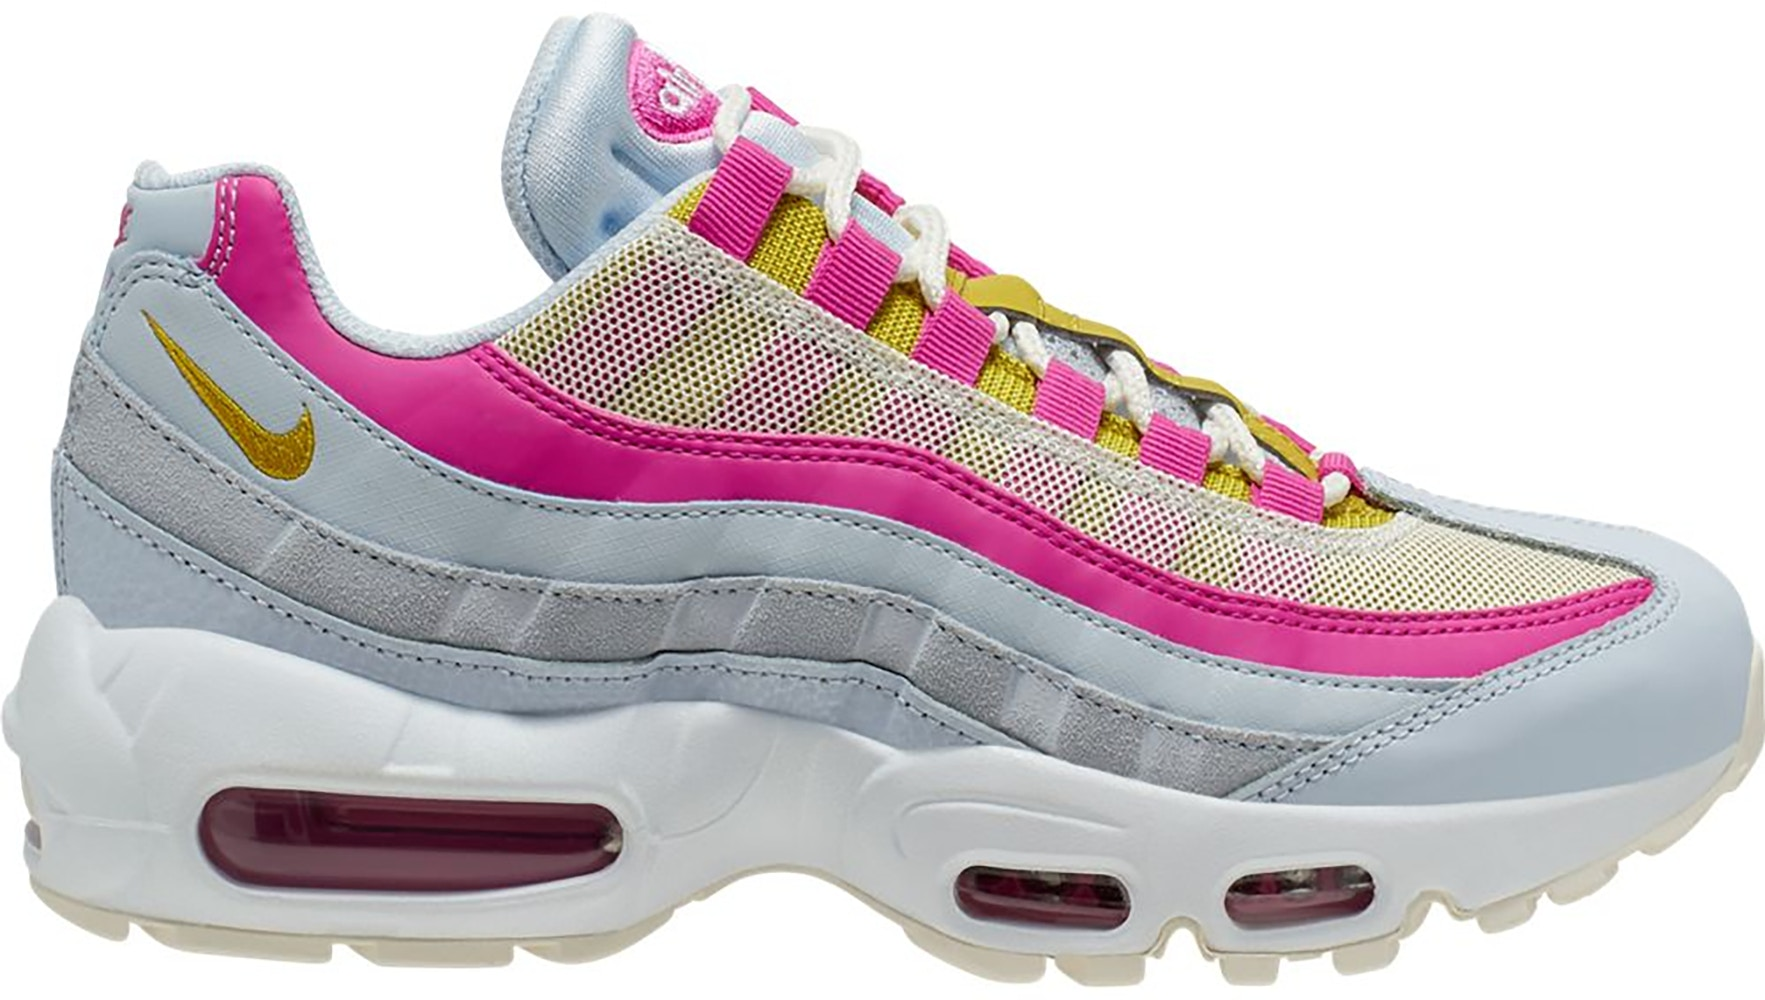 Nike Air Max 95 Football Grey Saffron Quartz Fire Pink (W)